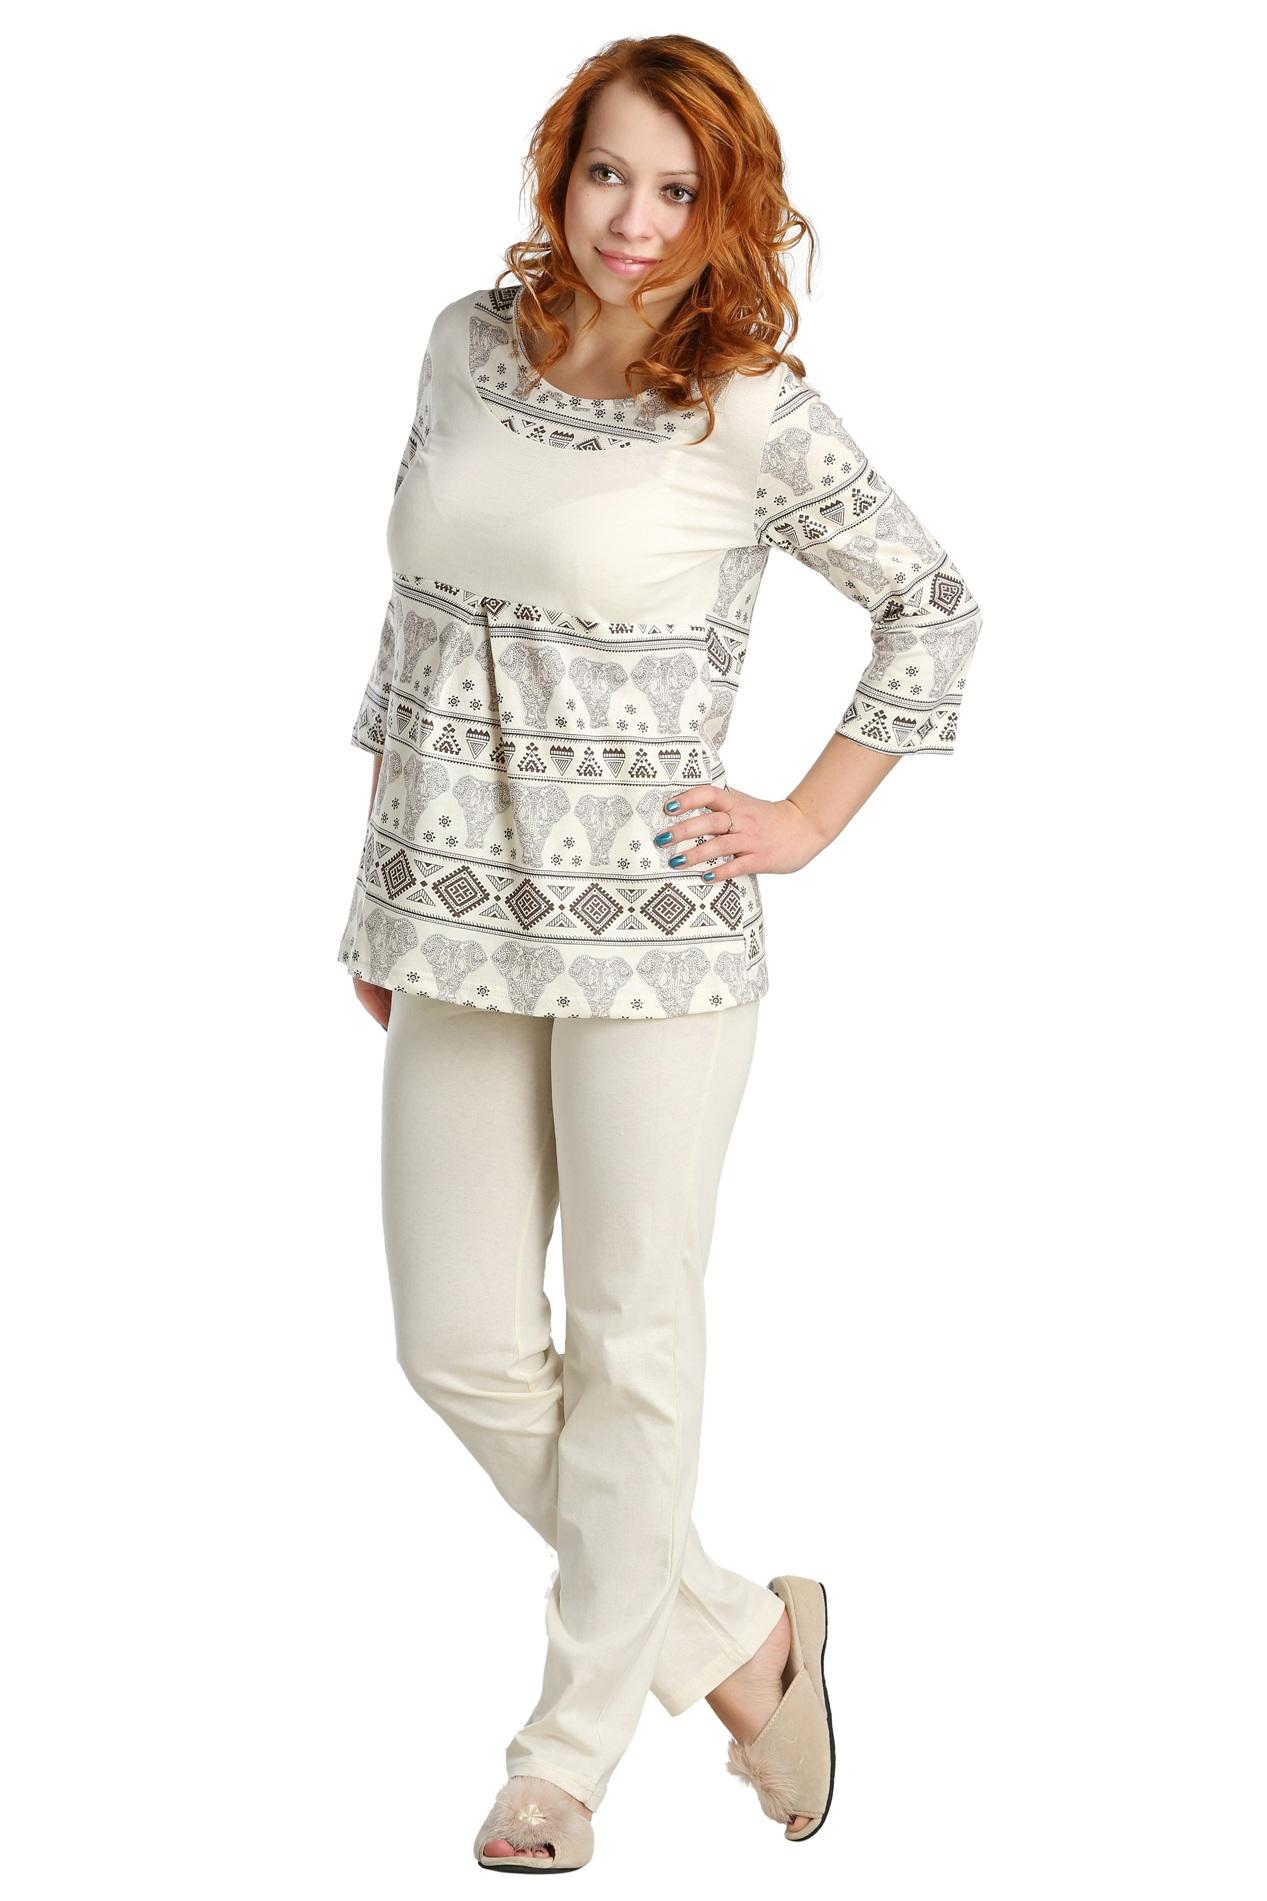 Жен. пижама арт. 16-0087 Молочный р. 44 пижама жен mia cara майка шорты botanical aw15 ubl lst 264 р 42 44 1119503